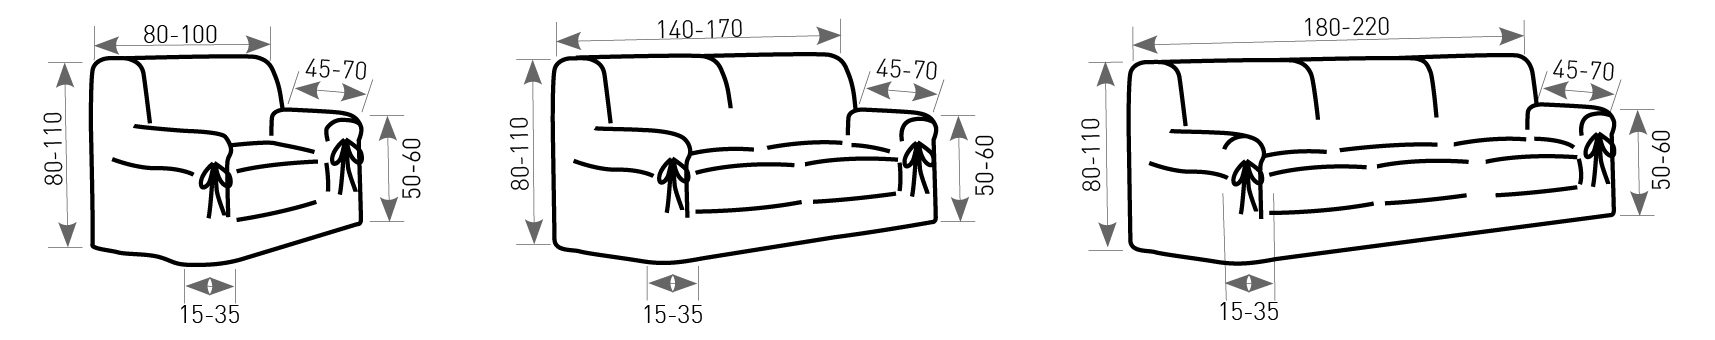 medidas-sofa-lazos.jpg